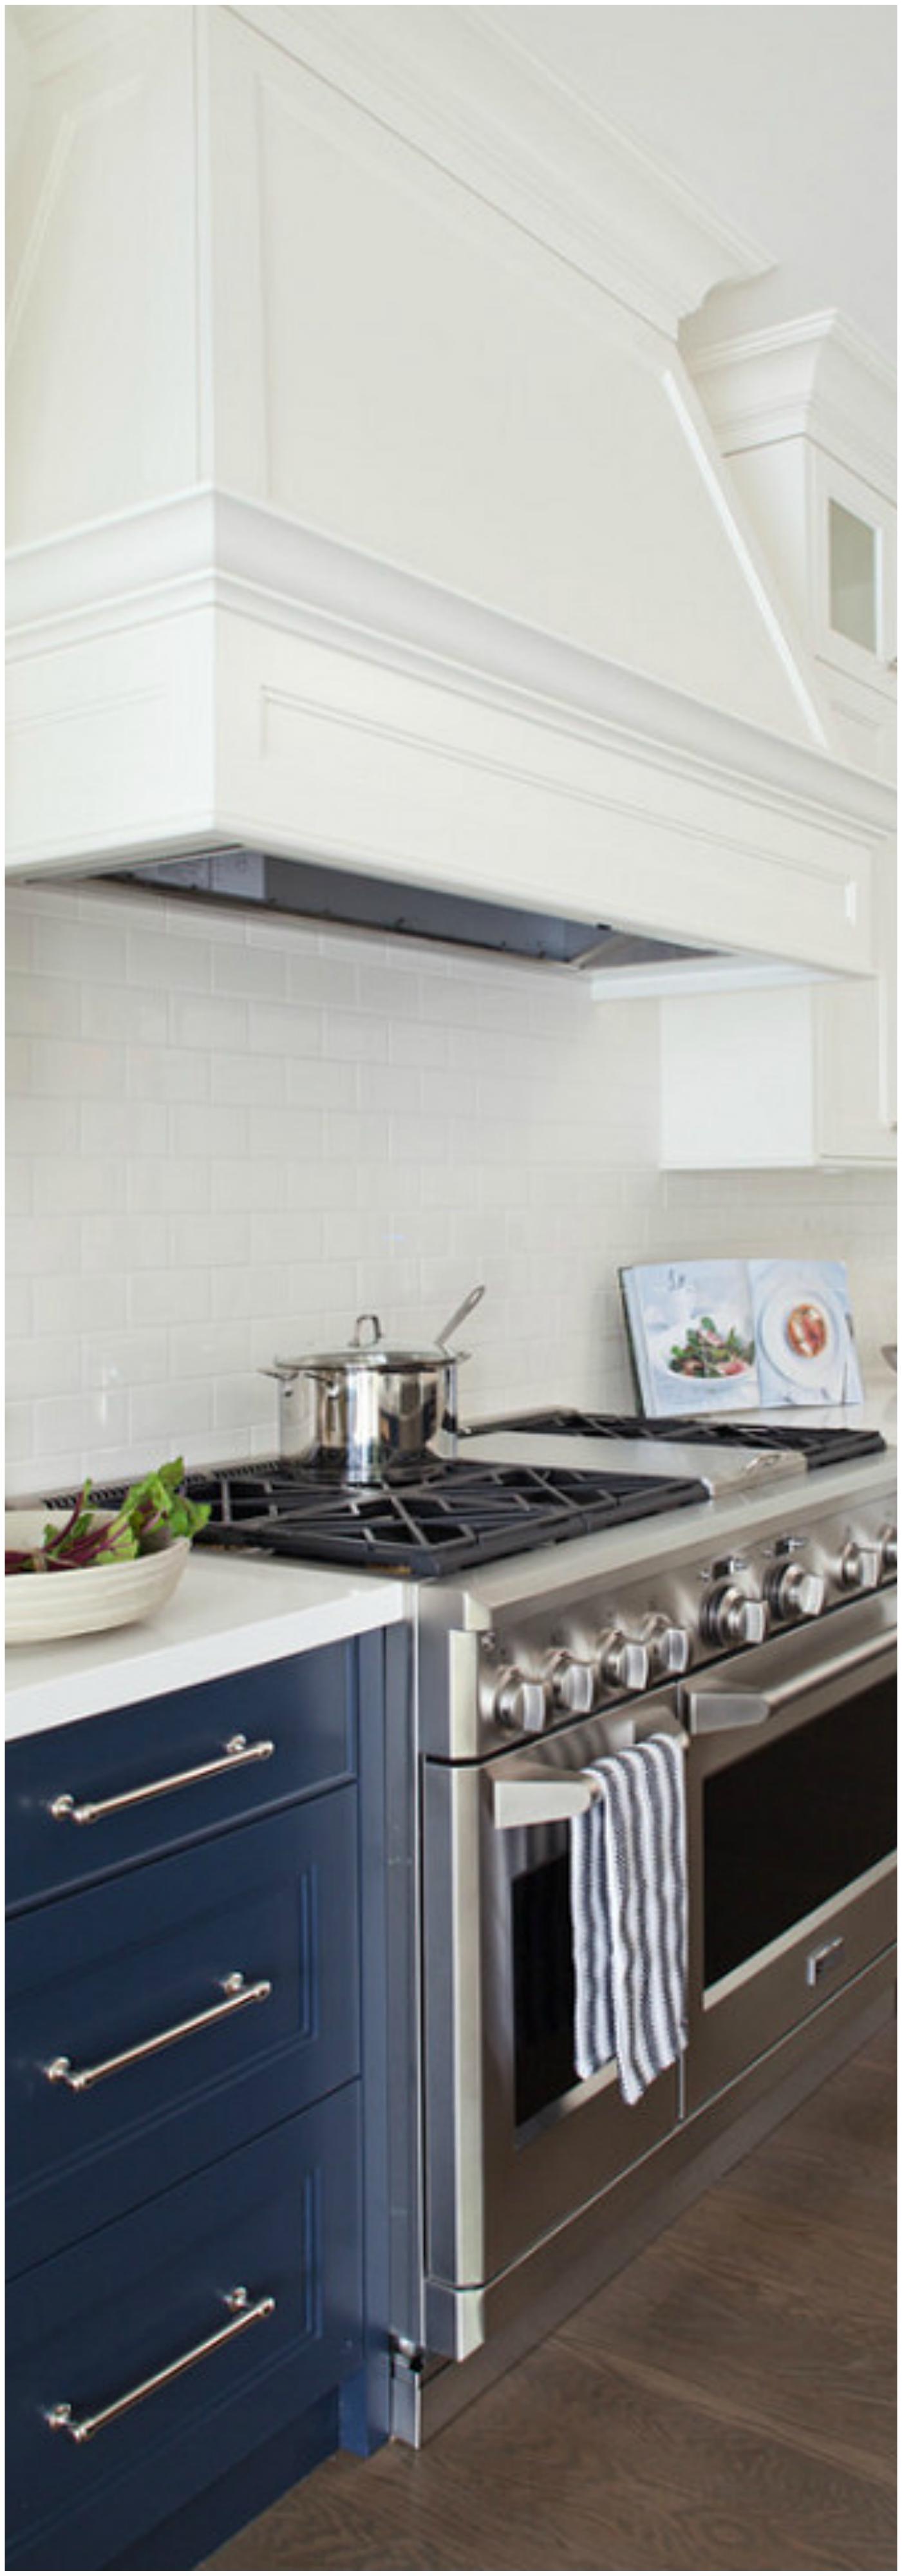 Kitchen Cabinets Design thewowdecor (35)